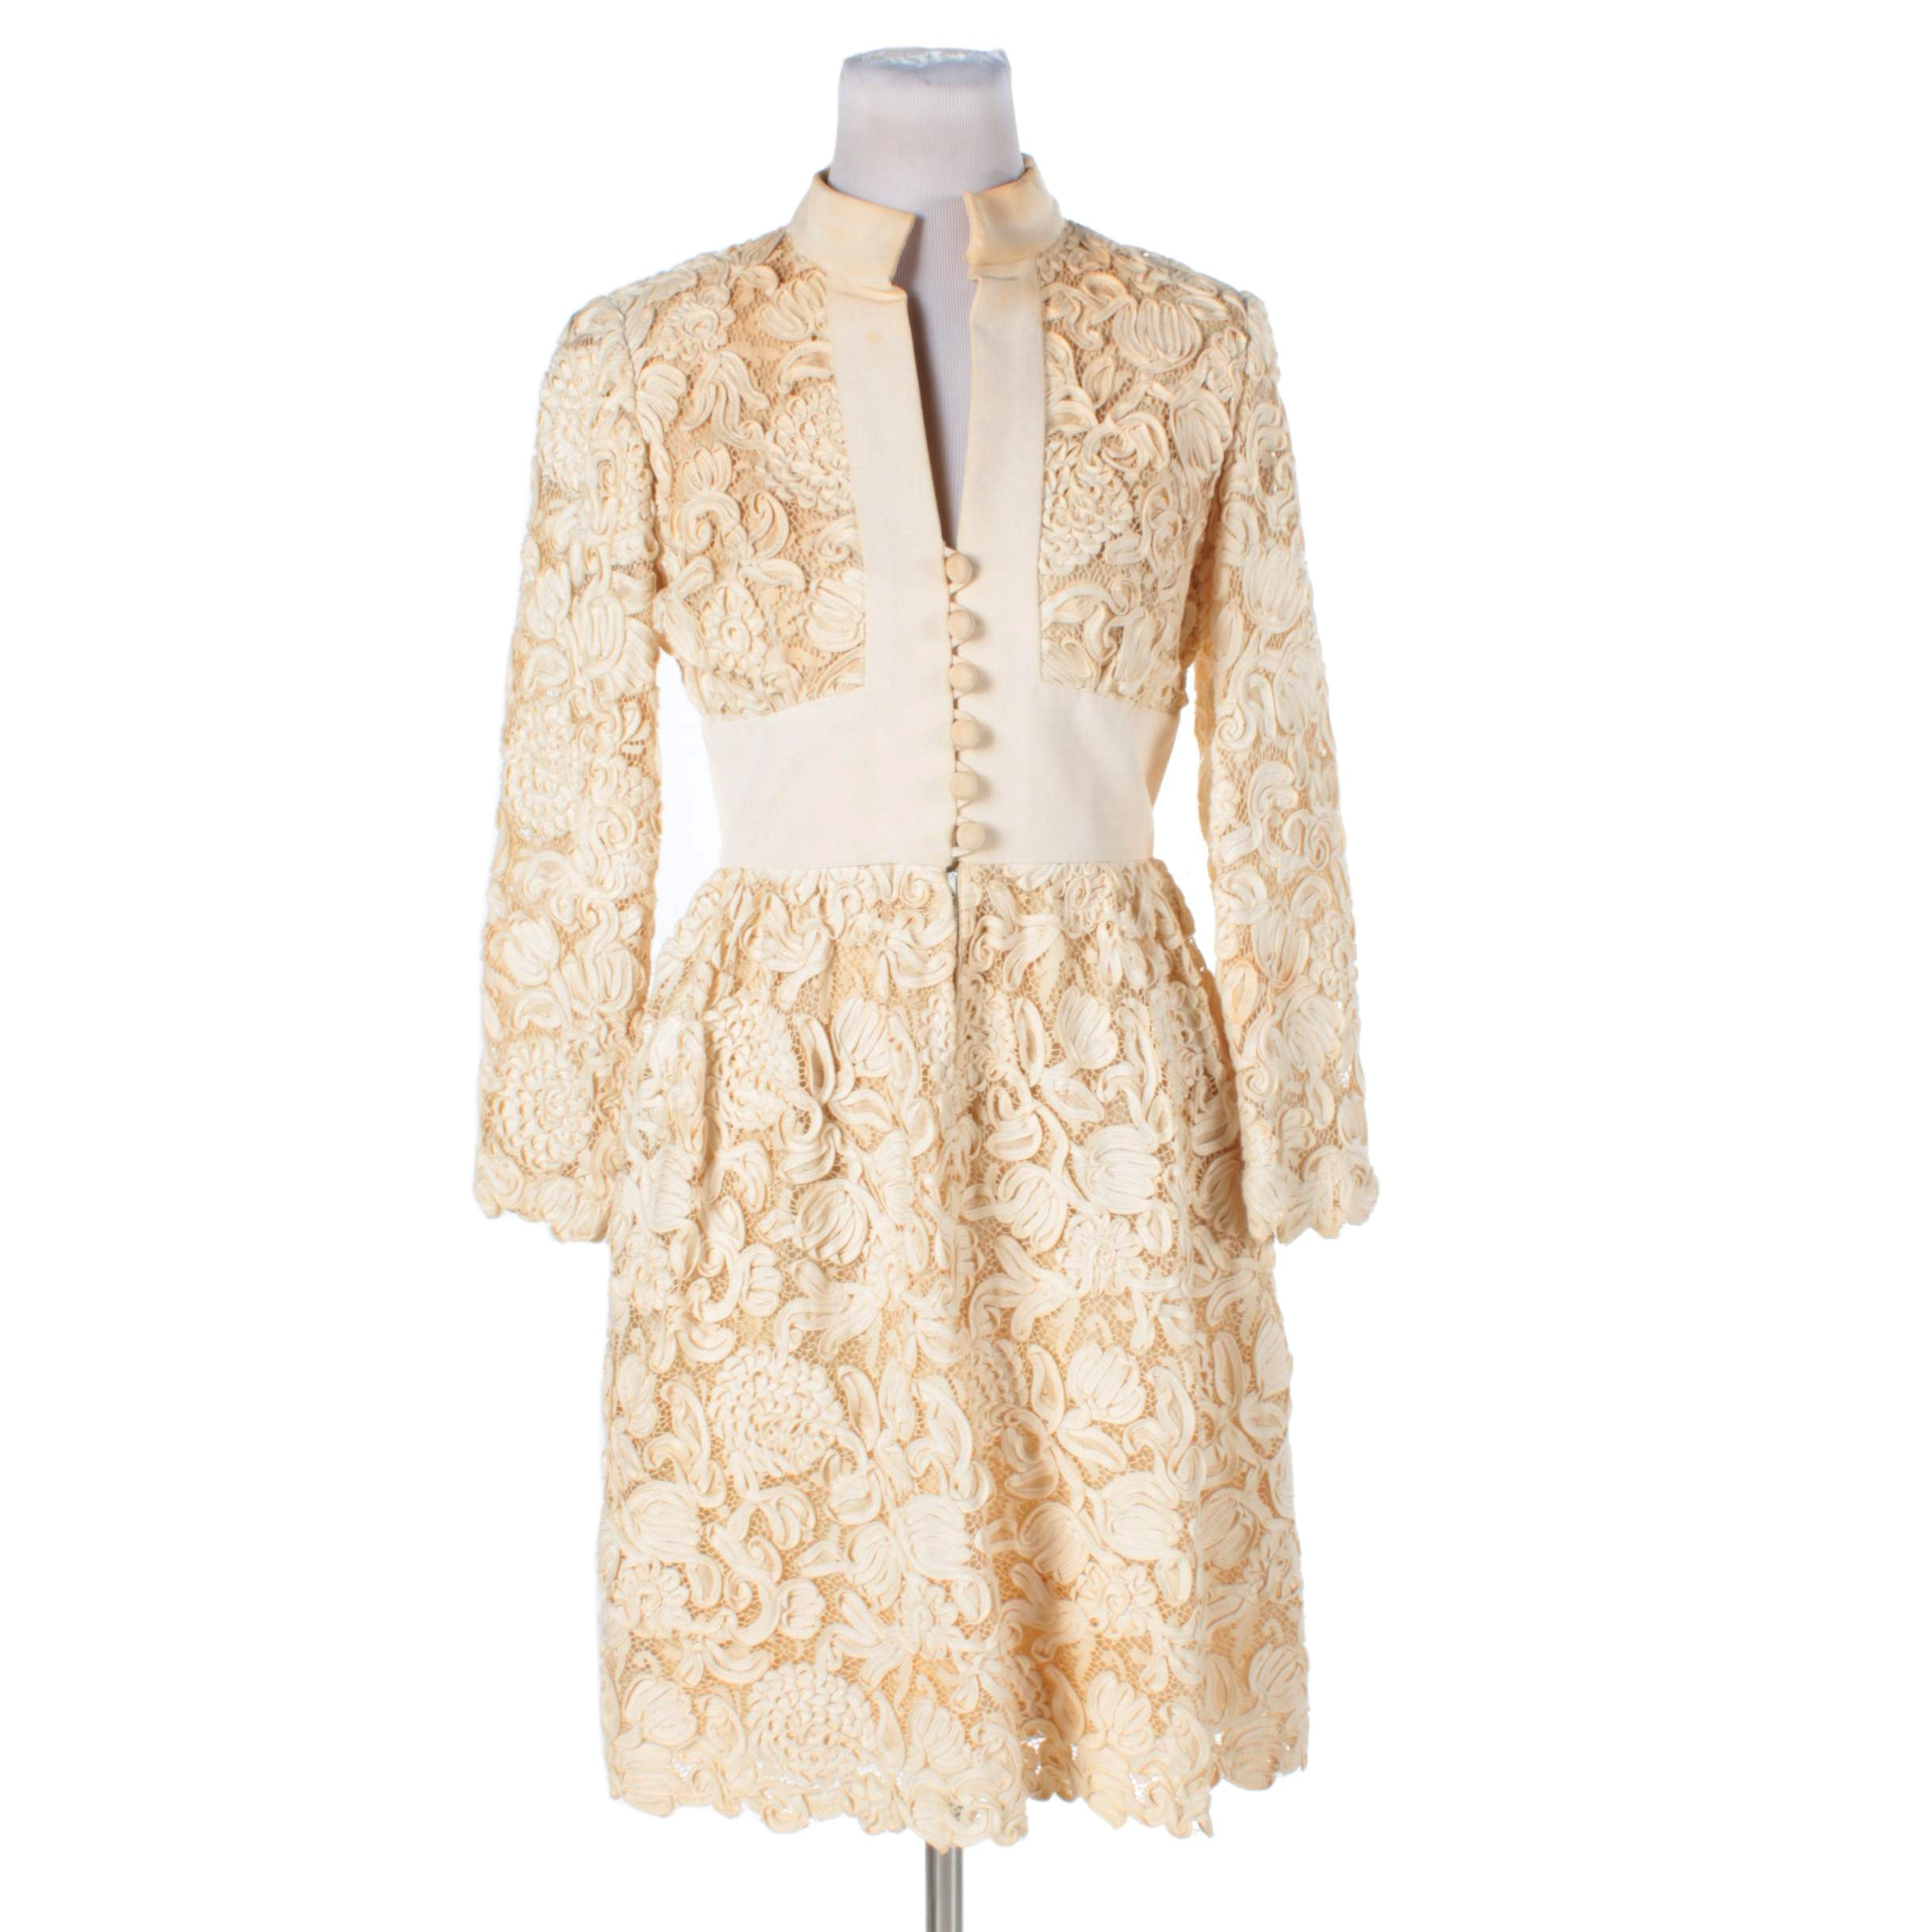 1960s Teal Traina Mod Cream-Colored Battenburg Lace Dress